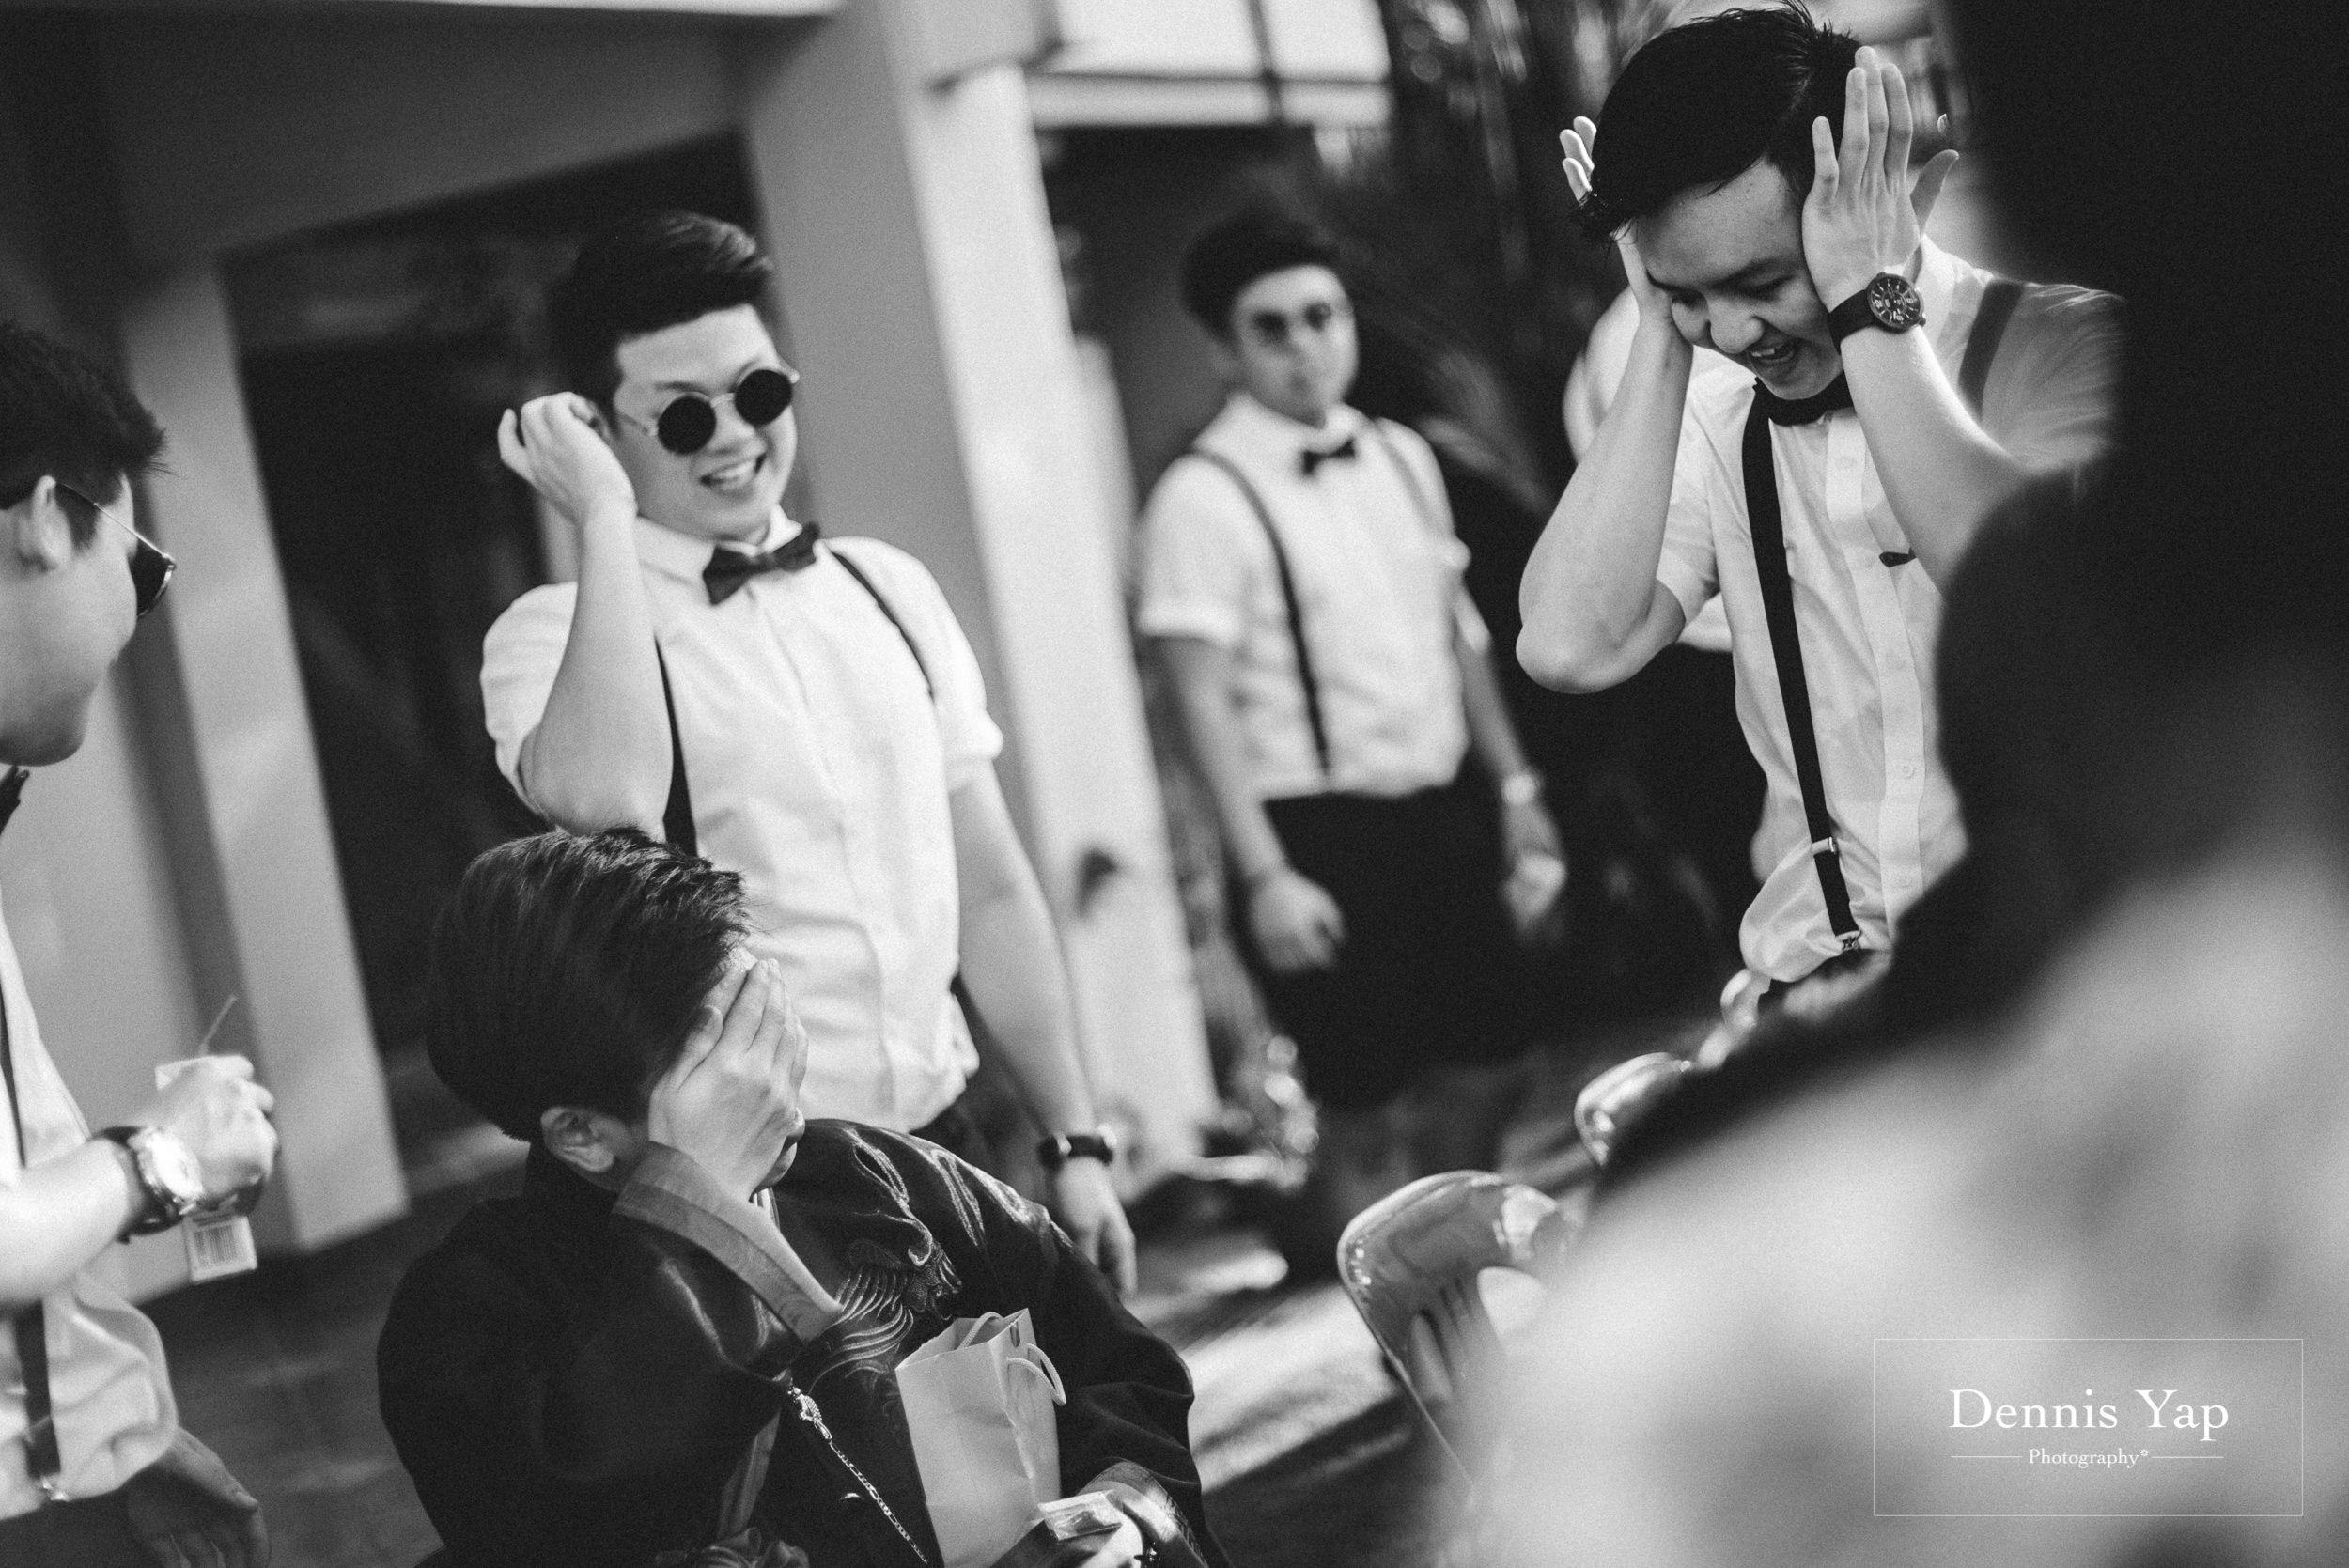 kuan rachel wedding day kuala lumpur melbourne gate crash dennis yap malaysia wedding photographer-11.jpg